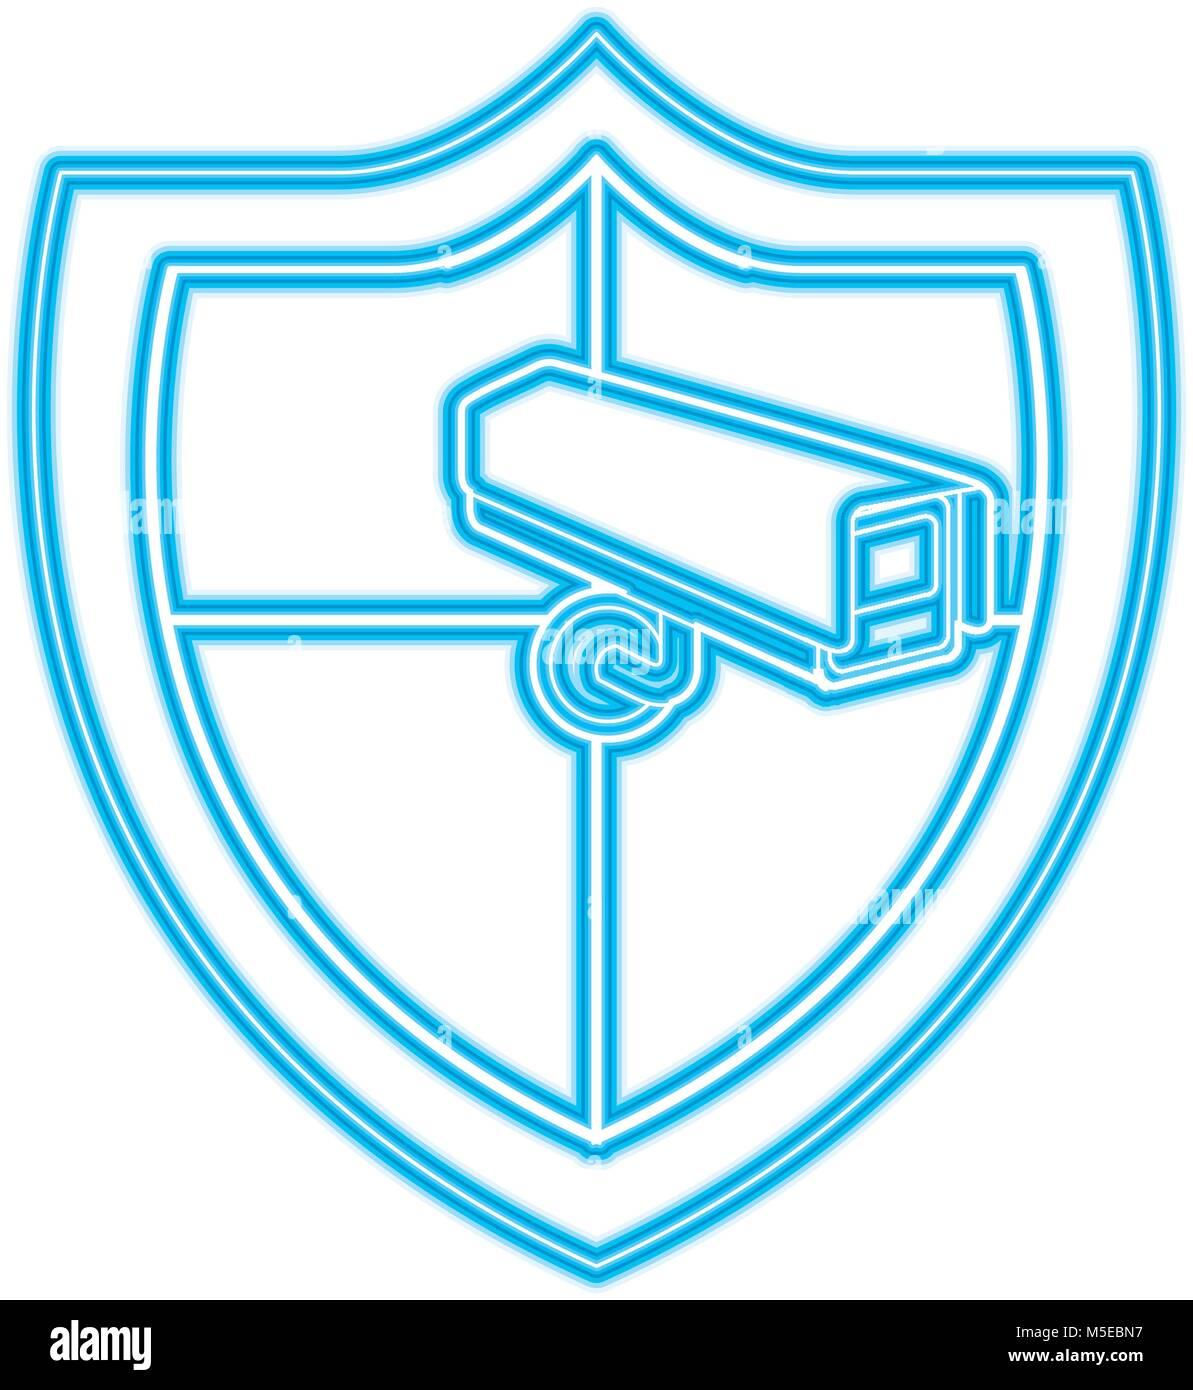 shield protection surveillance camera data system - Stock Image